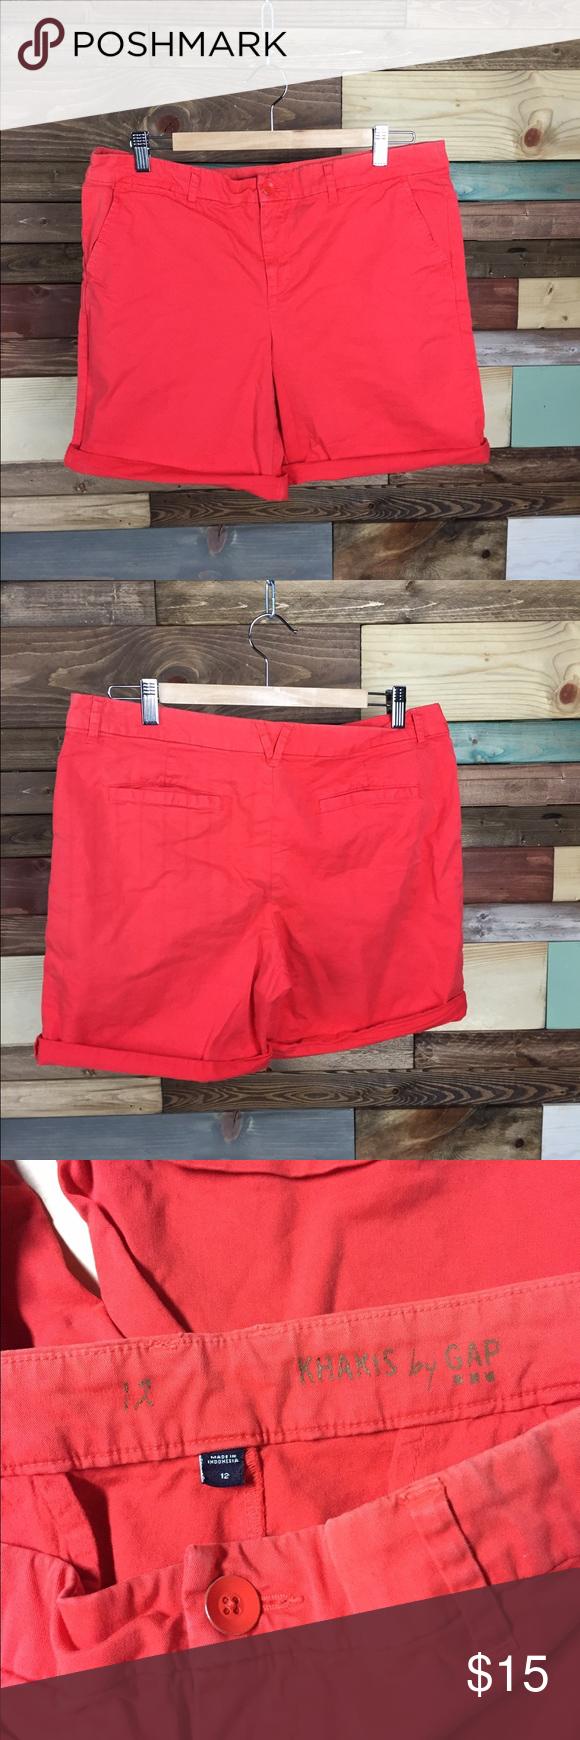 "Gap Coral Bermuda Roll up Shorts - 12 Gap Coral Bermuda Roll up Shorts - 12  Lightly distressed, perfect for vacation! Comfortable &  flattering high rise  Waist (laying flat): 18"" Inseam: 8"" Rise: 10""  #coral #vacation #woodsnap #vacation #summer #shorts #longshorts #bermudashorts #rollupshorts #highriseshorts #highwaistedshorts #longshorts #modest #comfortable #casualchic GAP Shorts Bermudas"